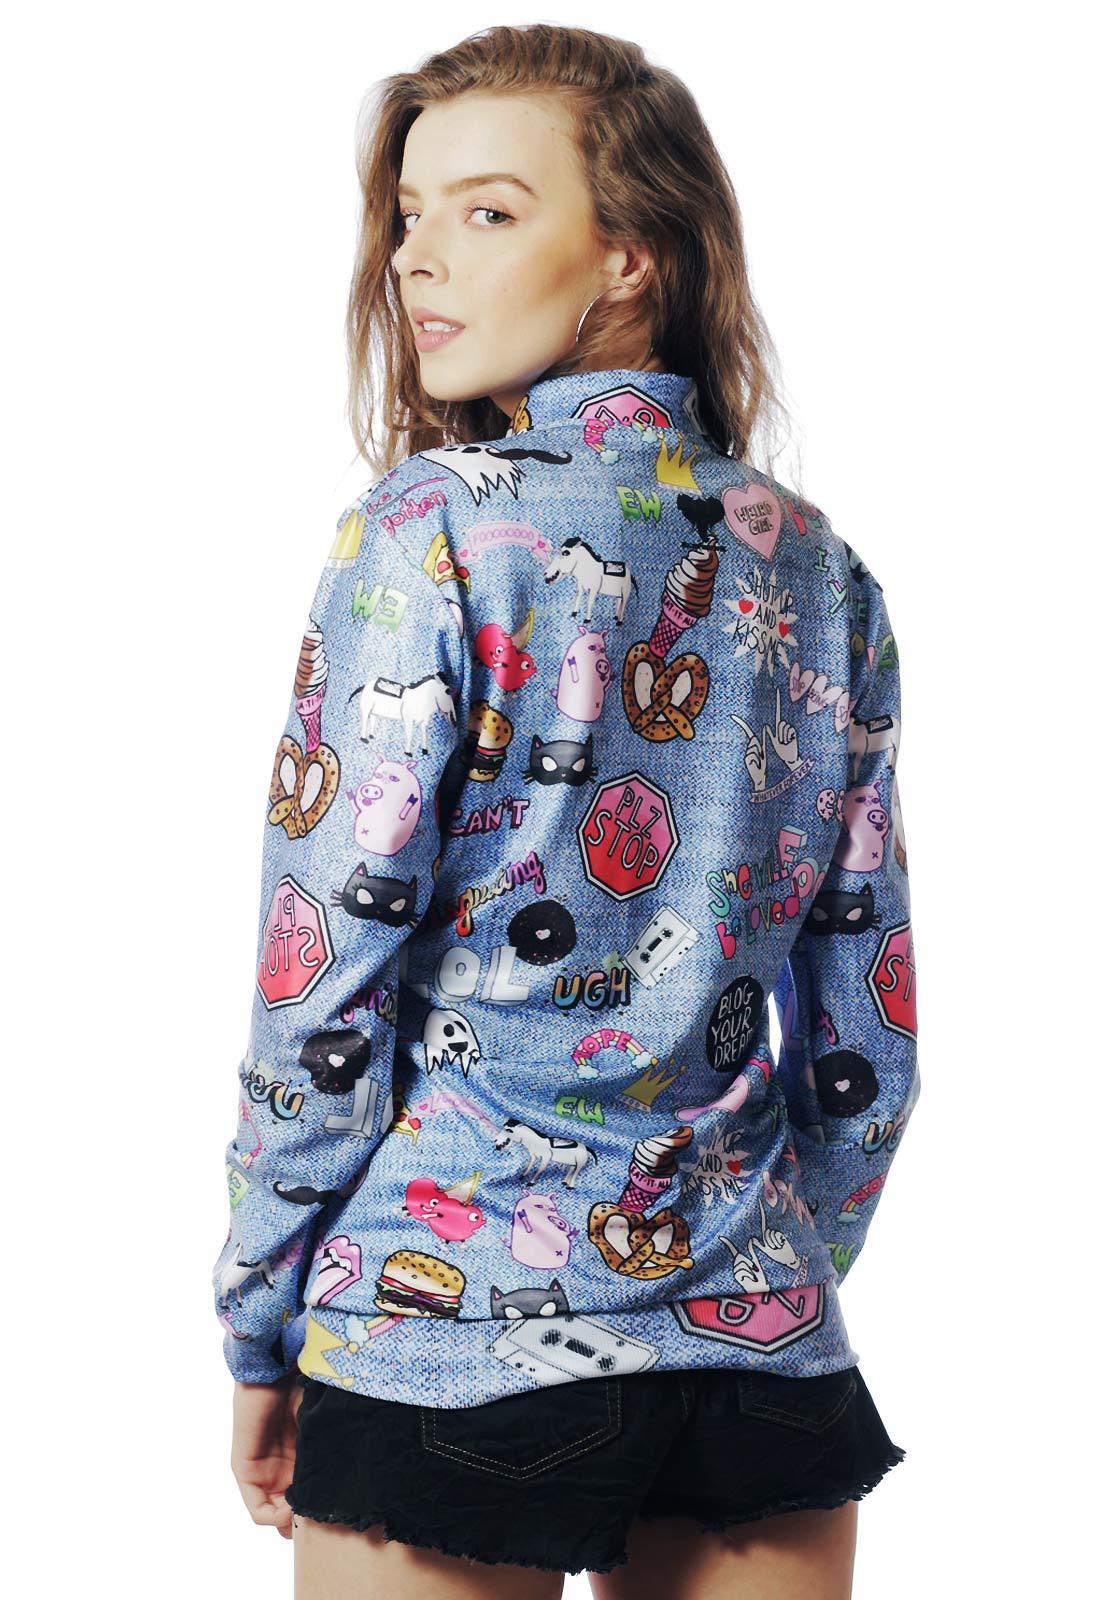 Jaqueta Bomber Estampada Tumblr ElephunK Full Print  Unissex Lol Jeans